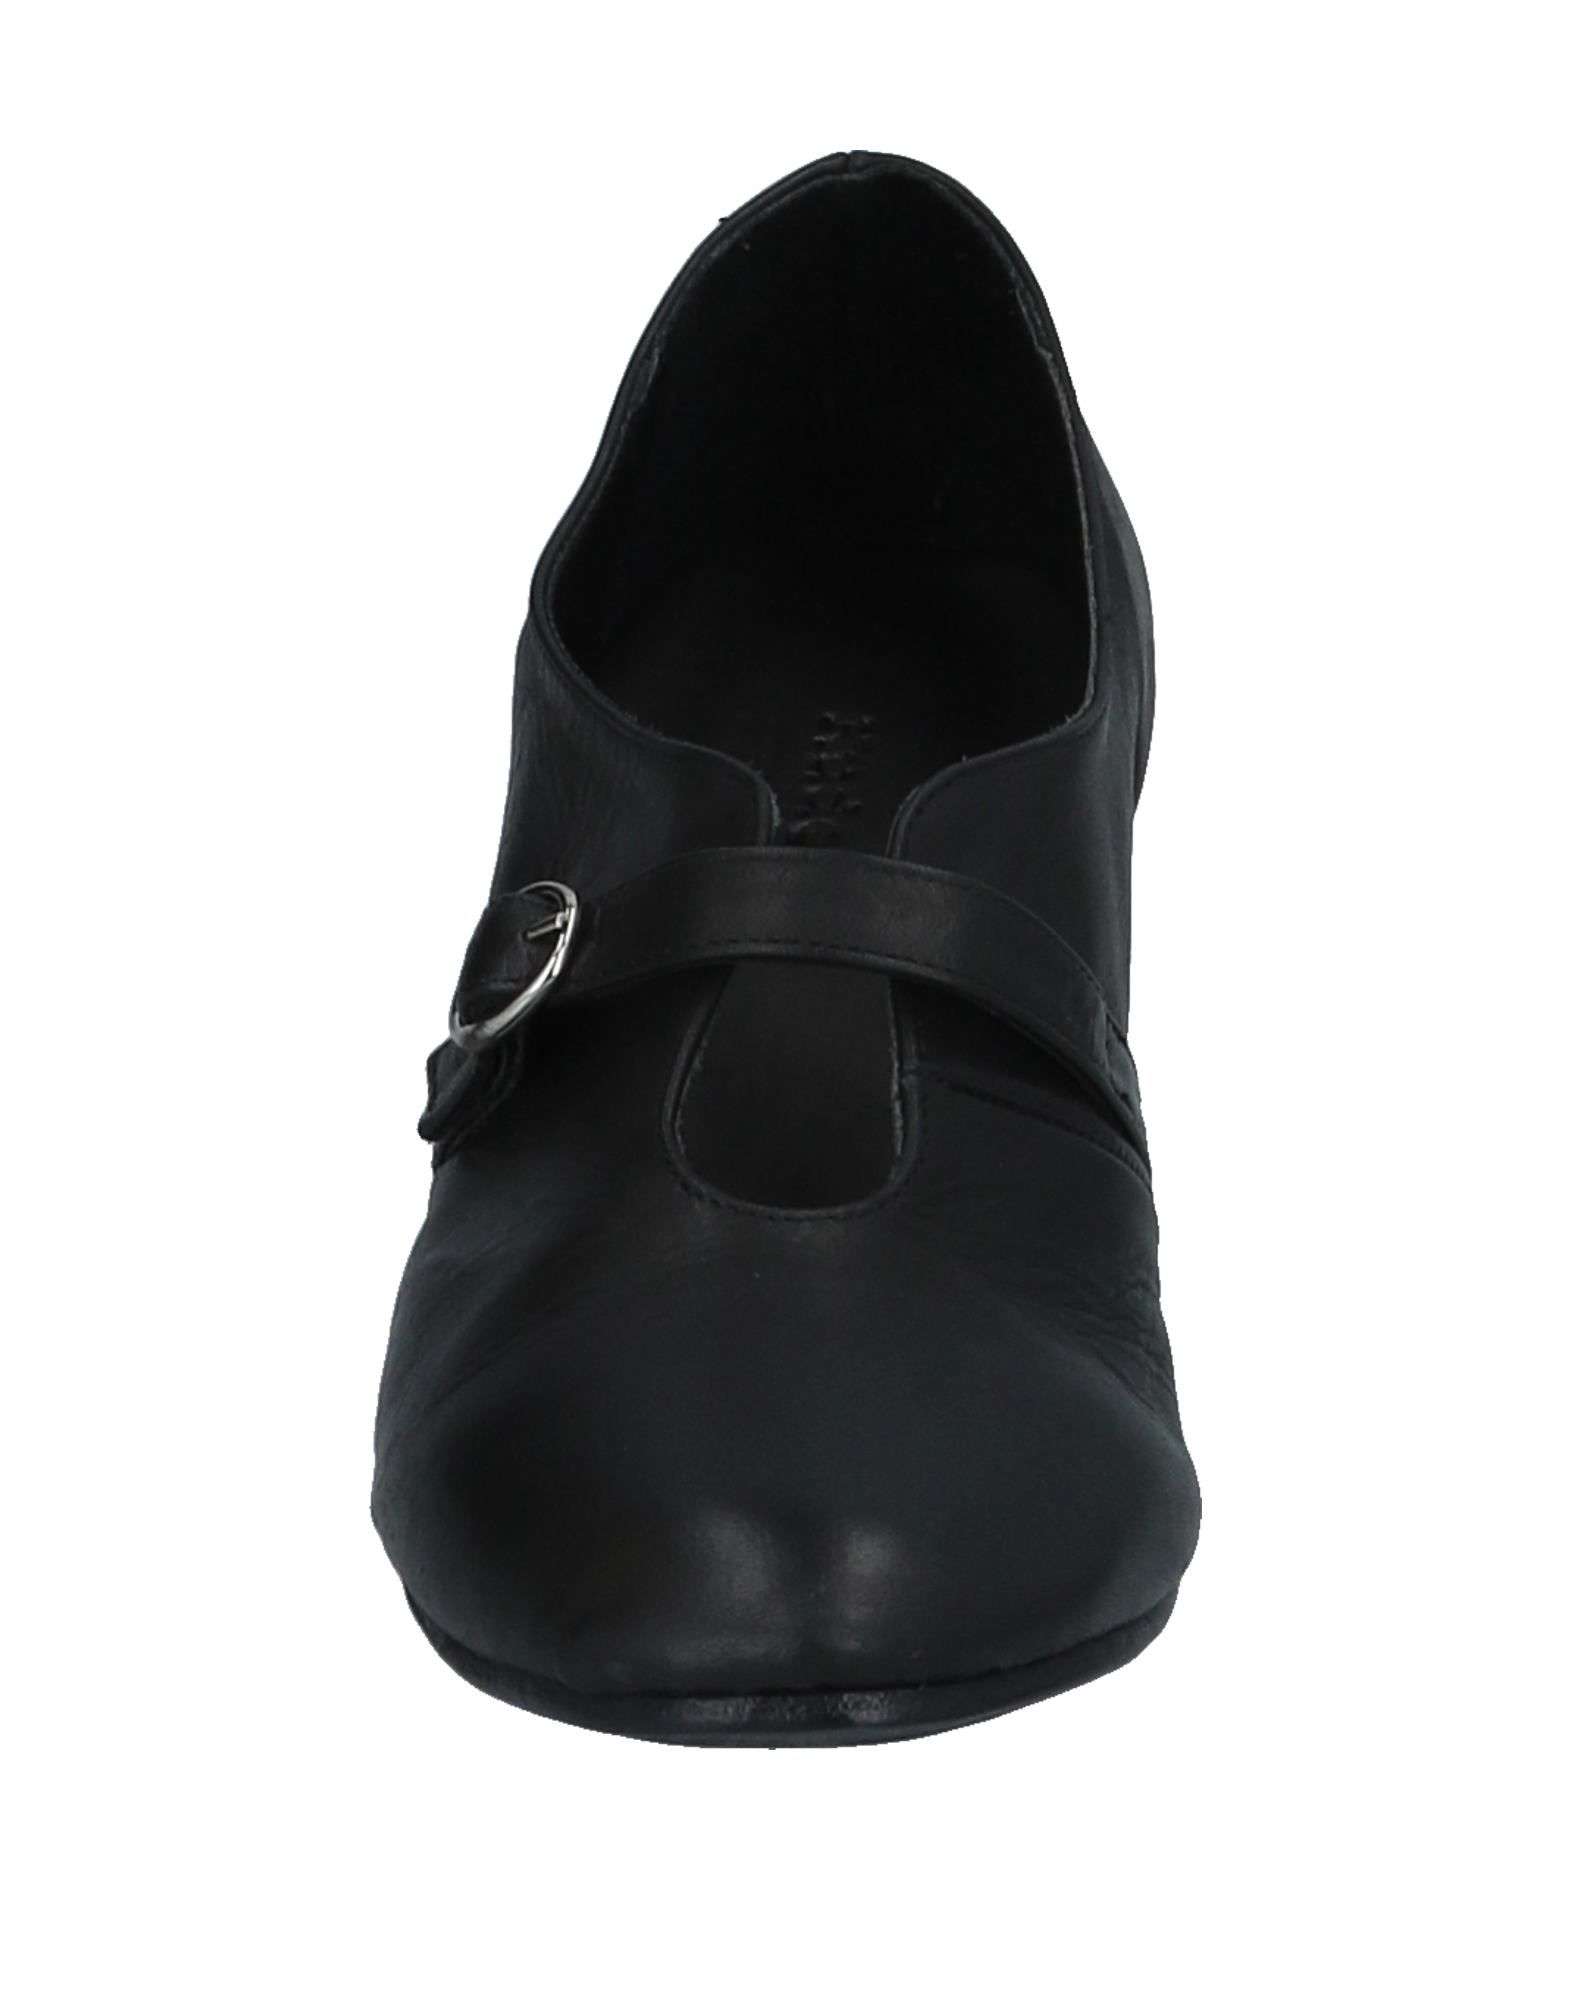 Gut um billige Damen Schuhe zu tragenKudetà Pumps Damen billige  11539893LC a3a963